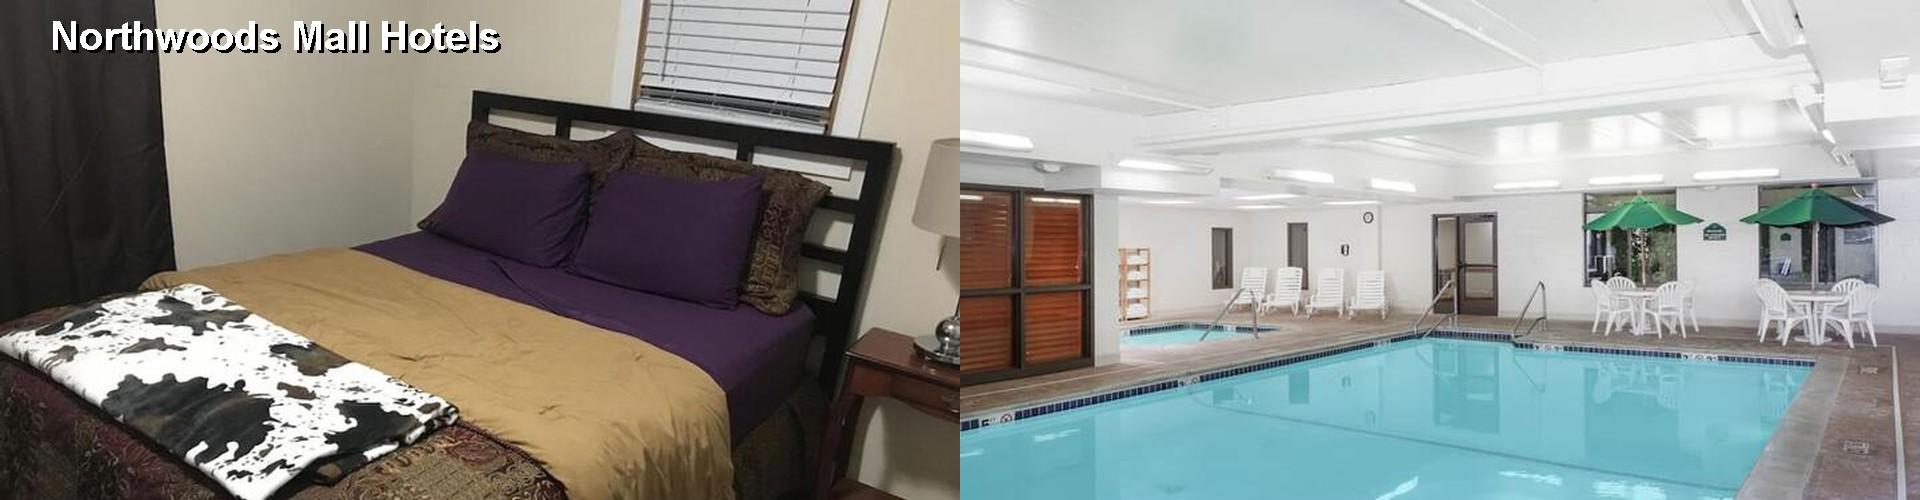 5 Best Hotels Near Northwoods Mall